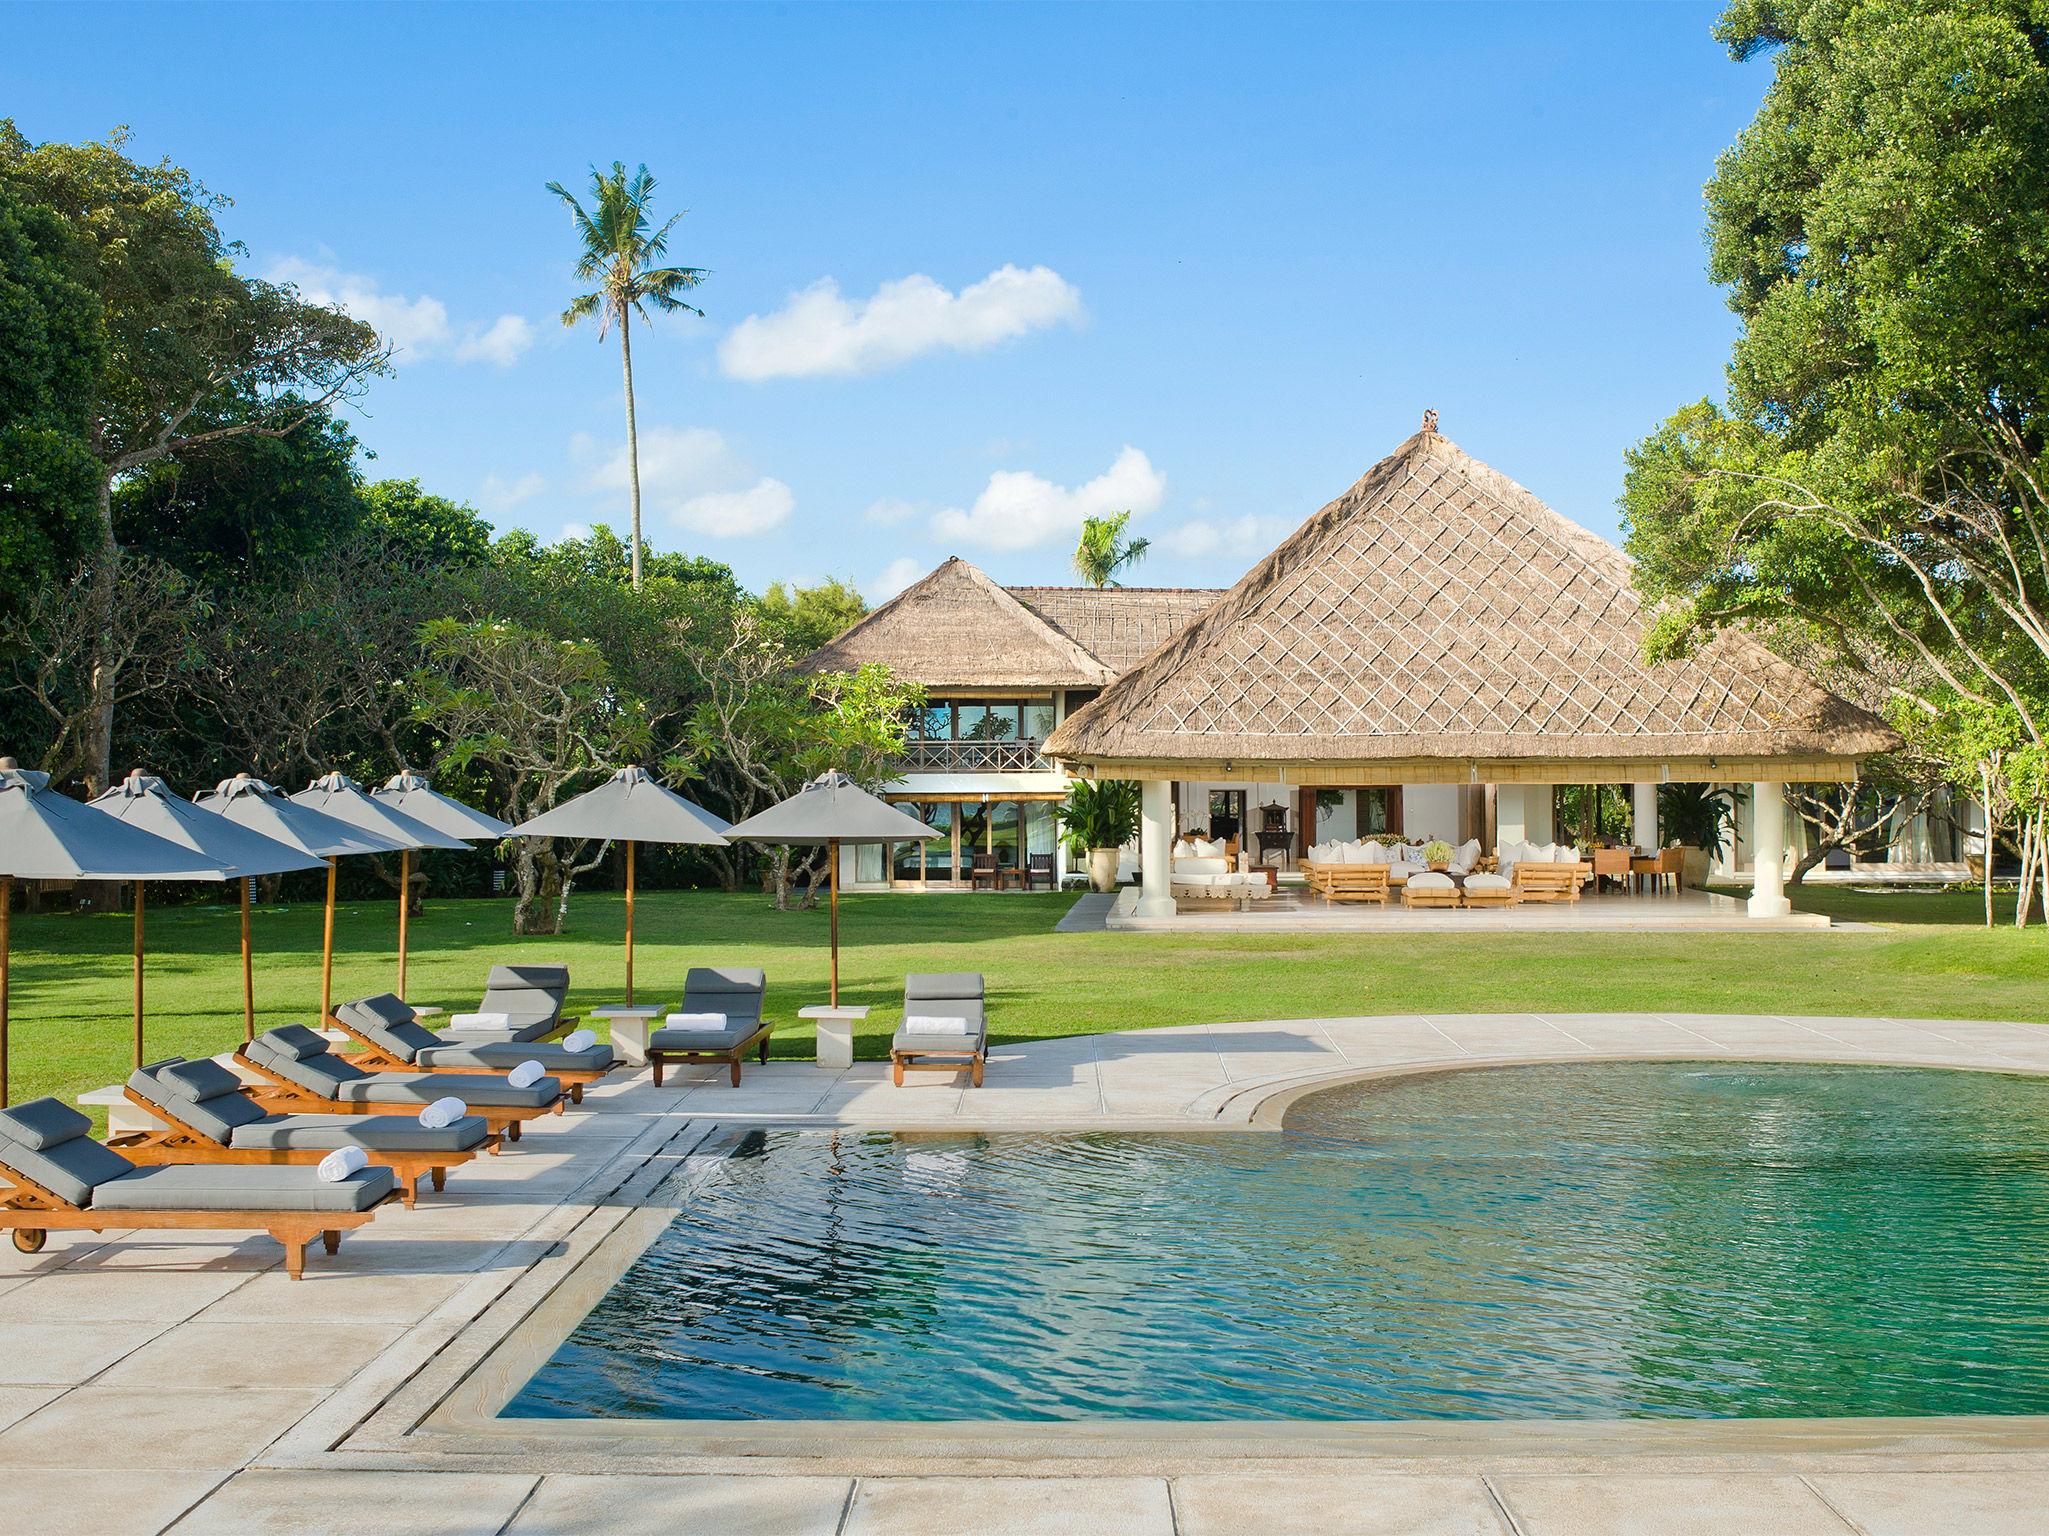 Atas Ombak - Pool and house